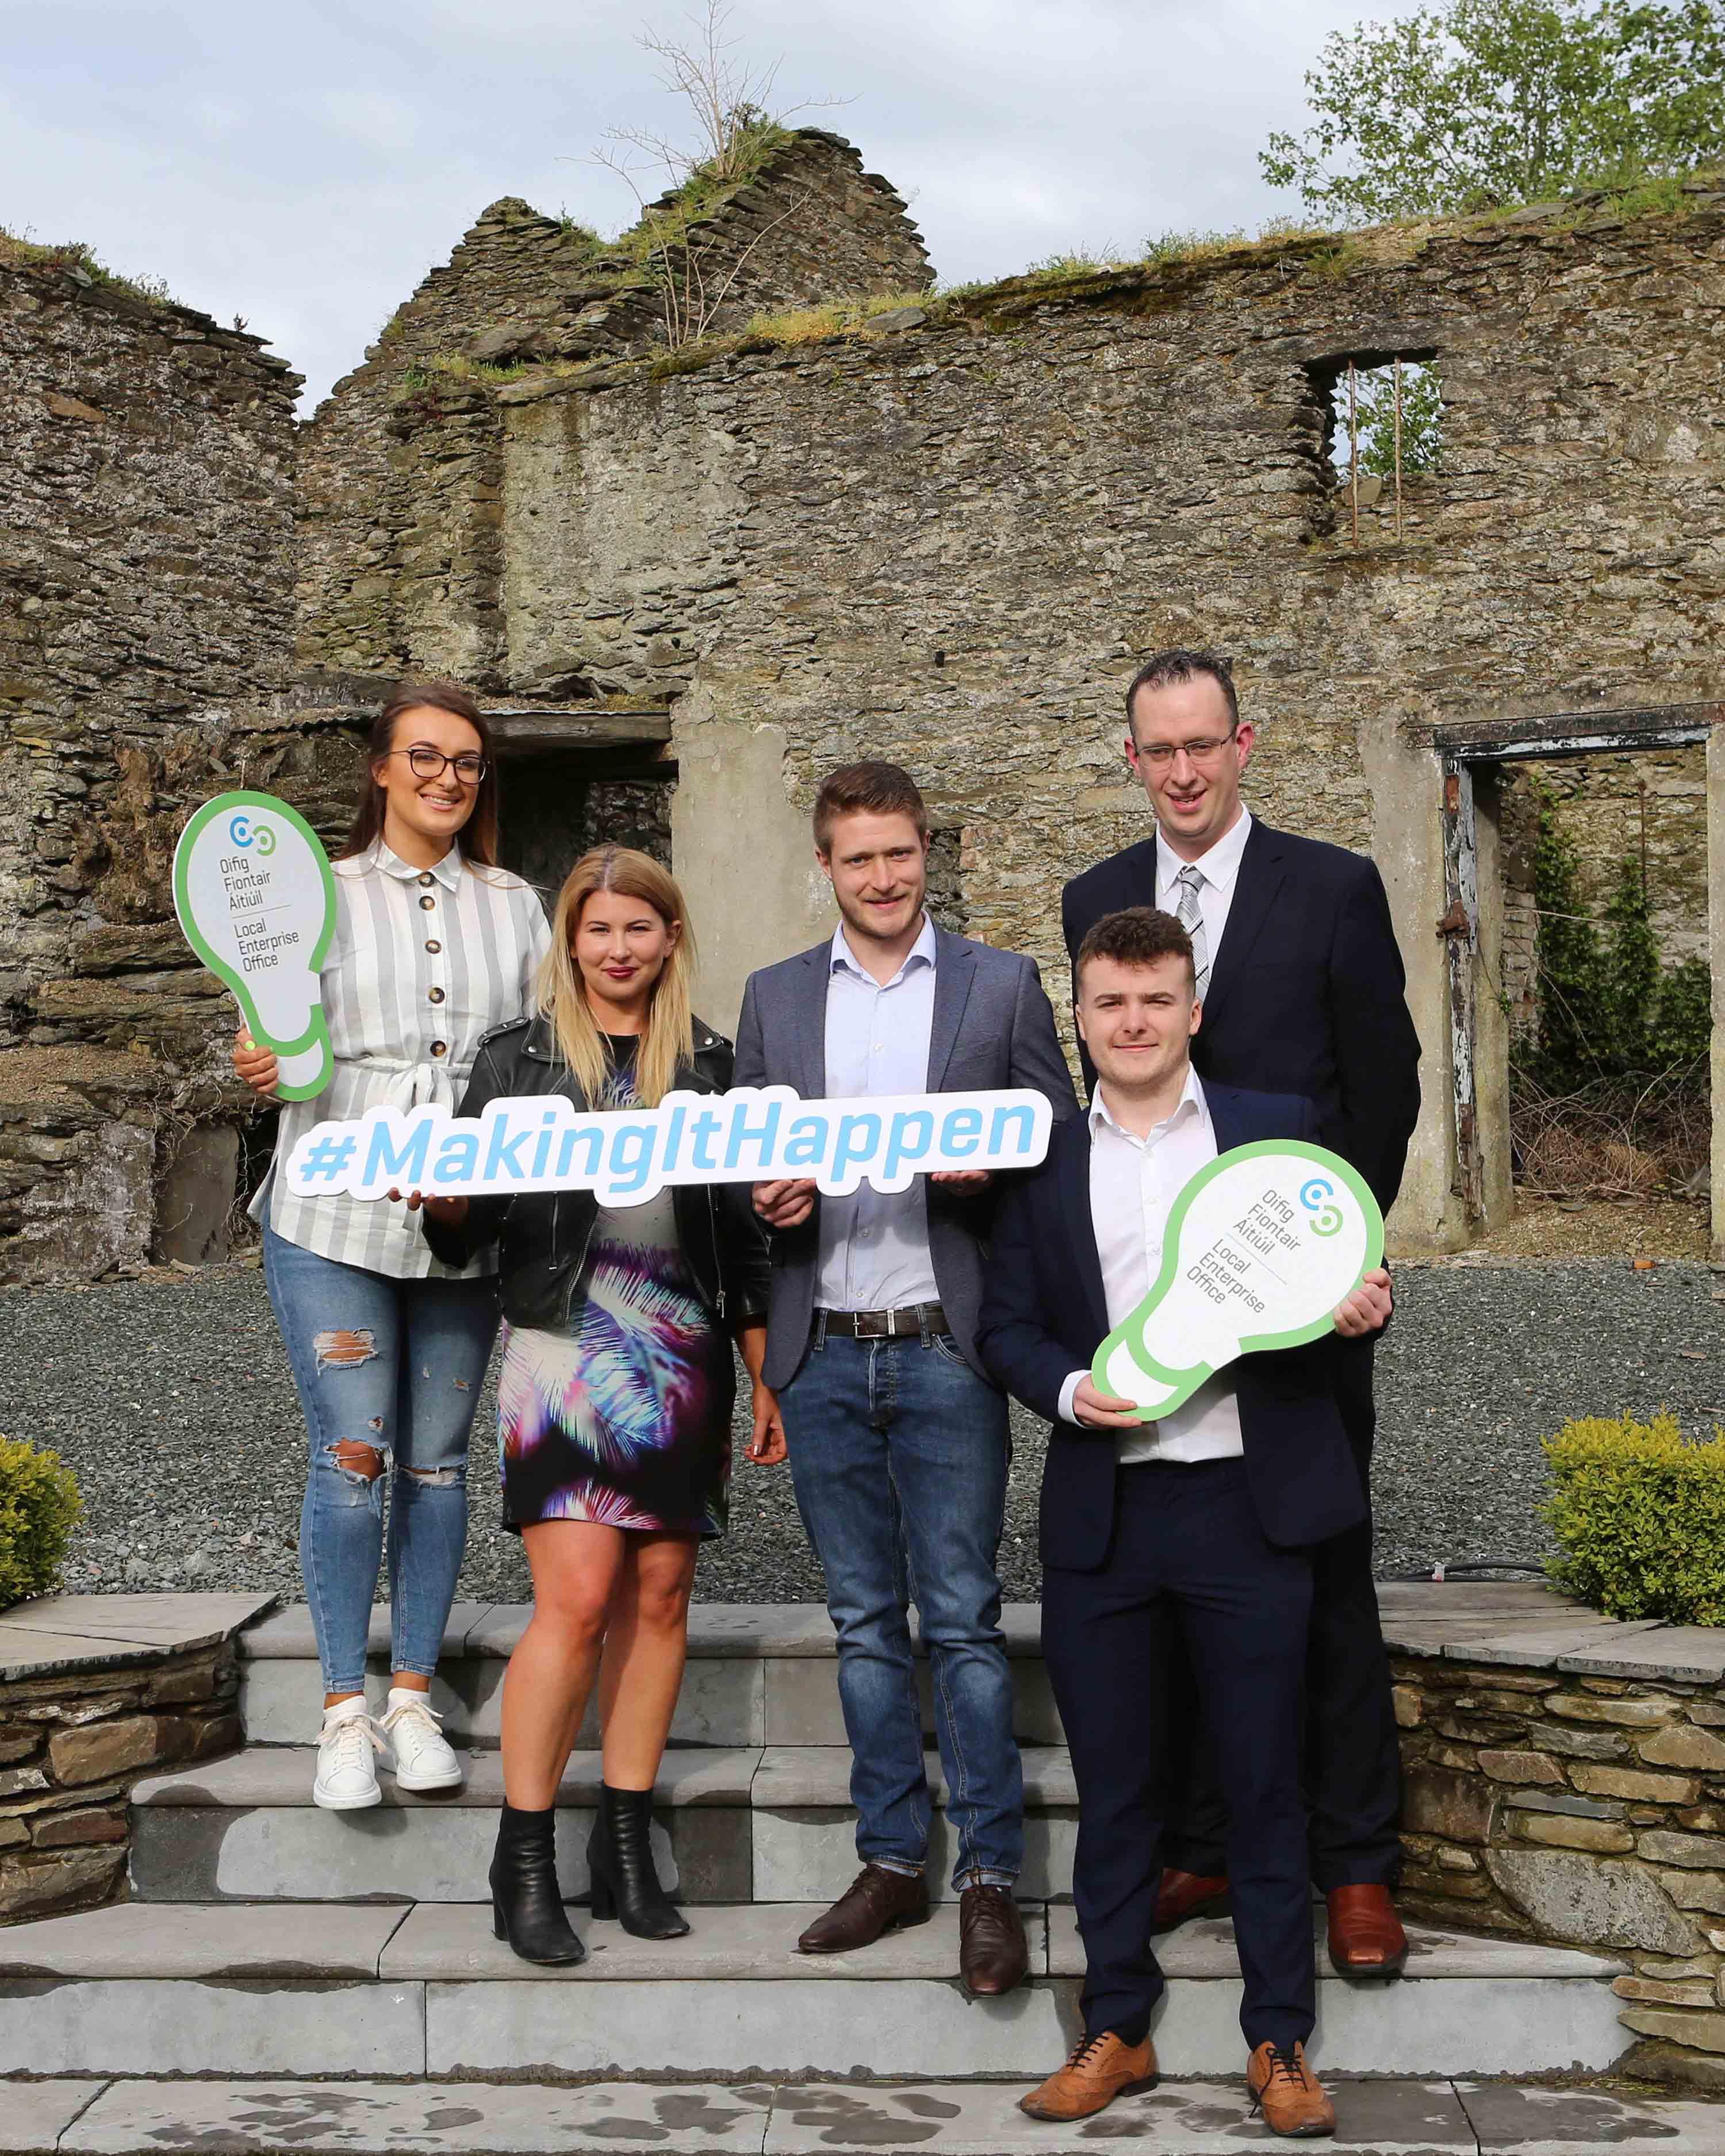 Irish Best Young Entrepreneur Awards 2019, Jenny Callanan Photography, Drogheda, Co.Louth